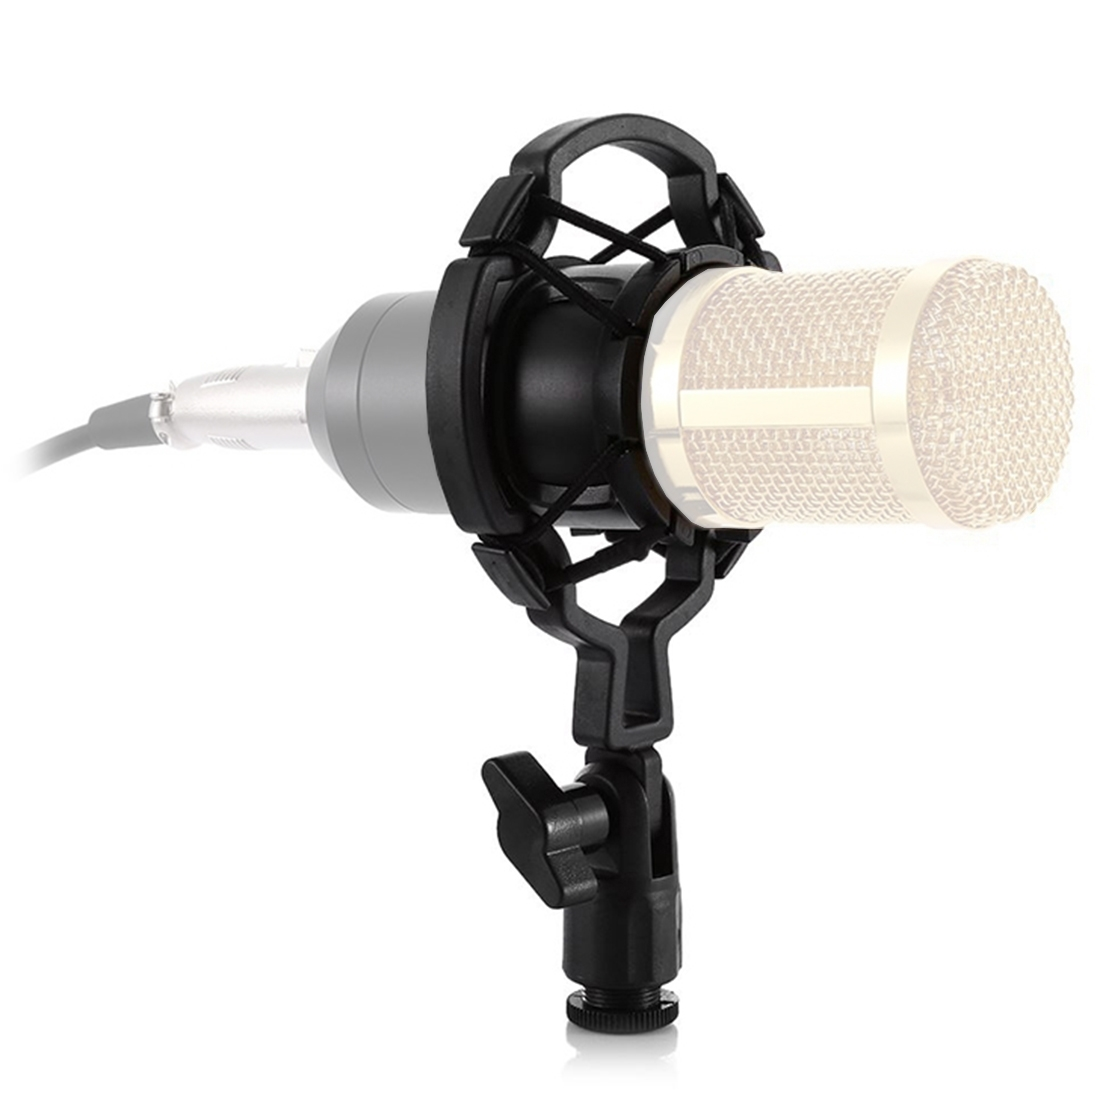 Plastic Microphone Shock Mount Holder Stand, for Studio Recording, Live  Broadcast, Live Show, KTV, etc